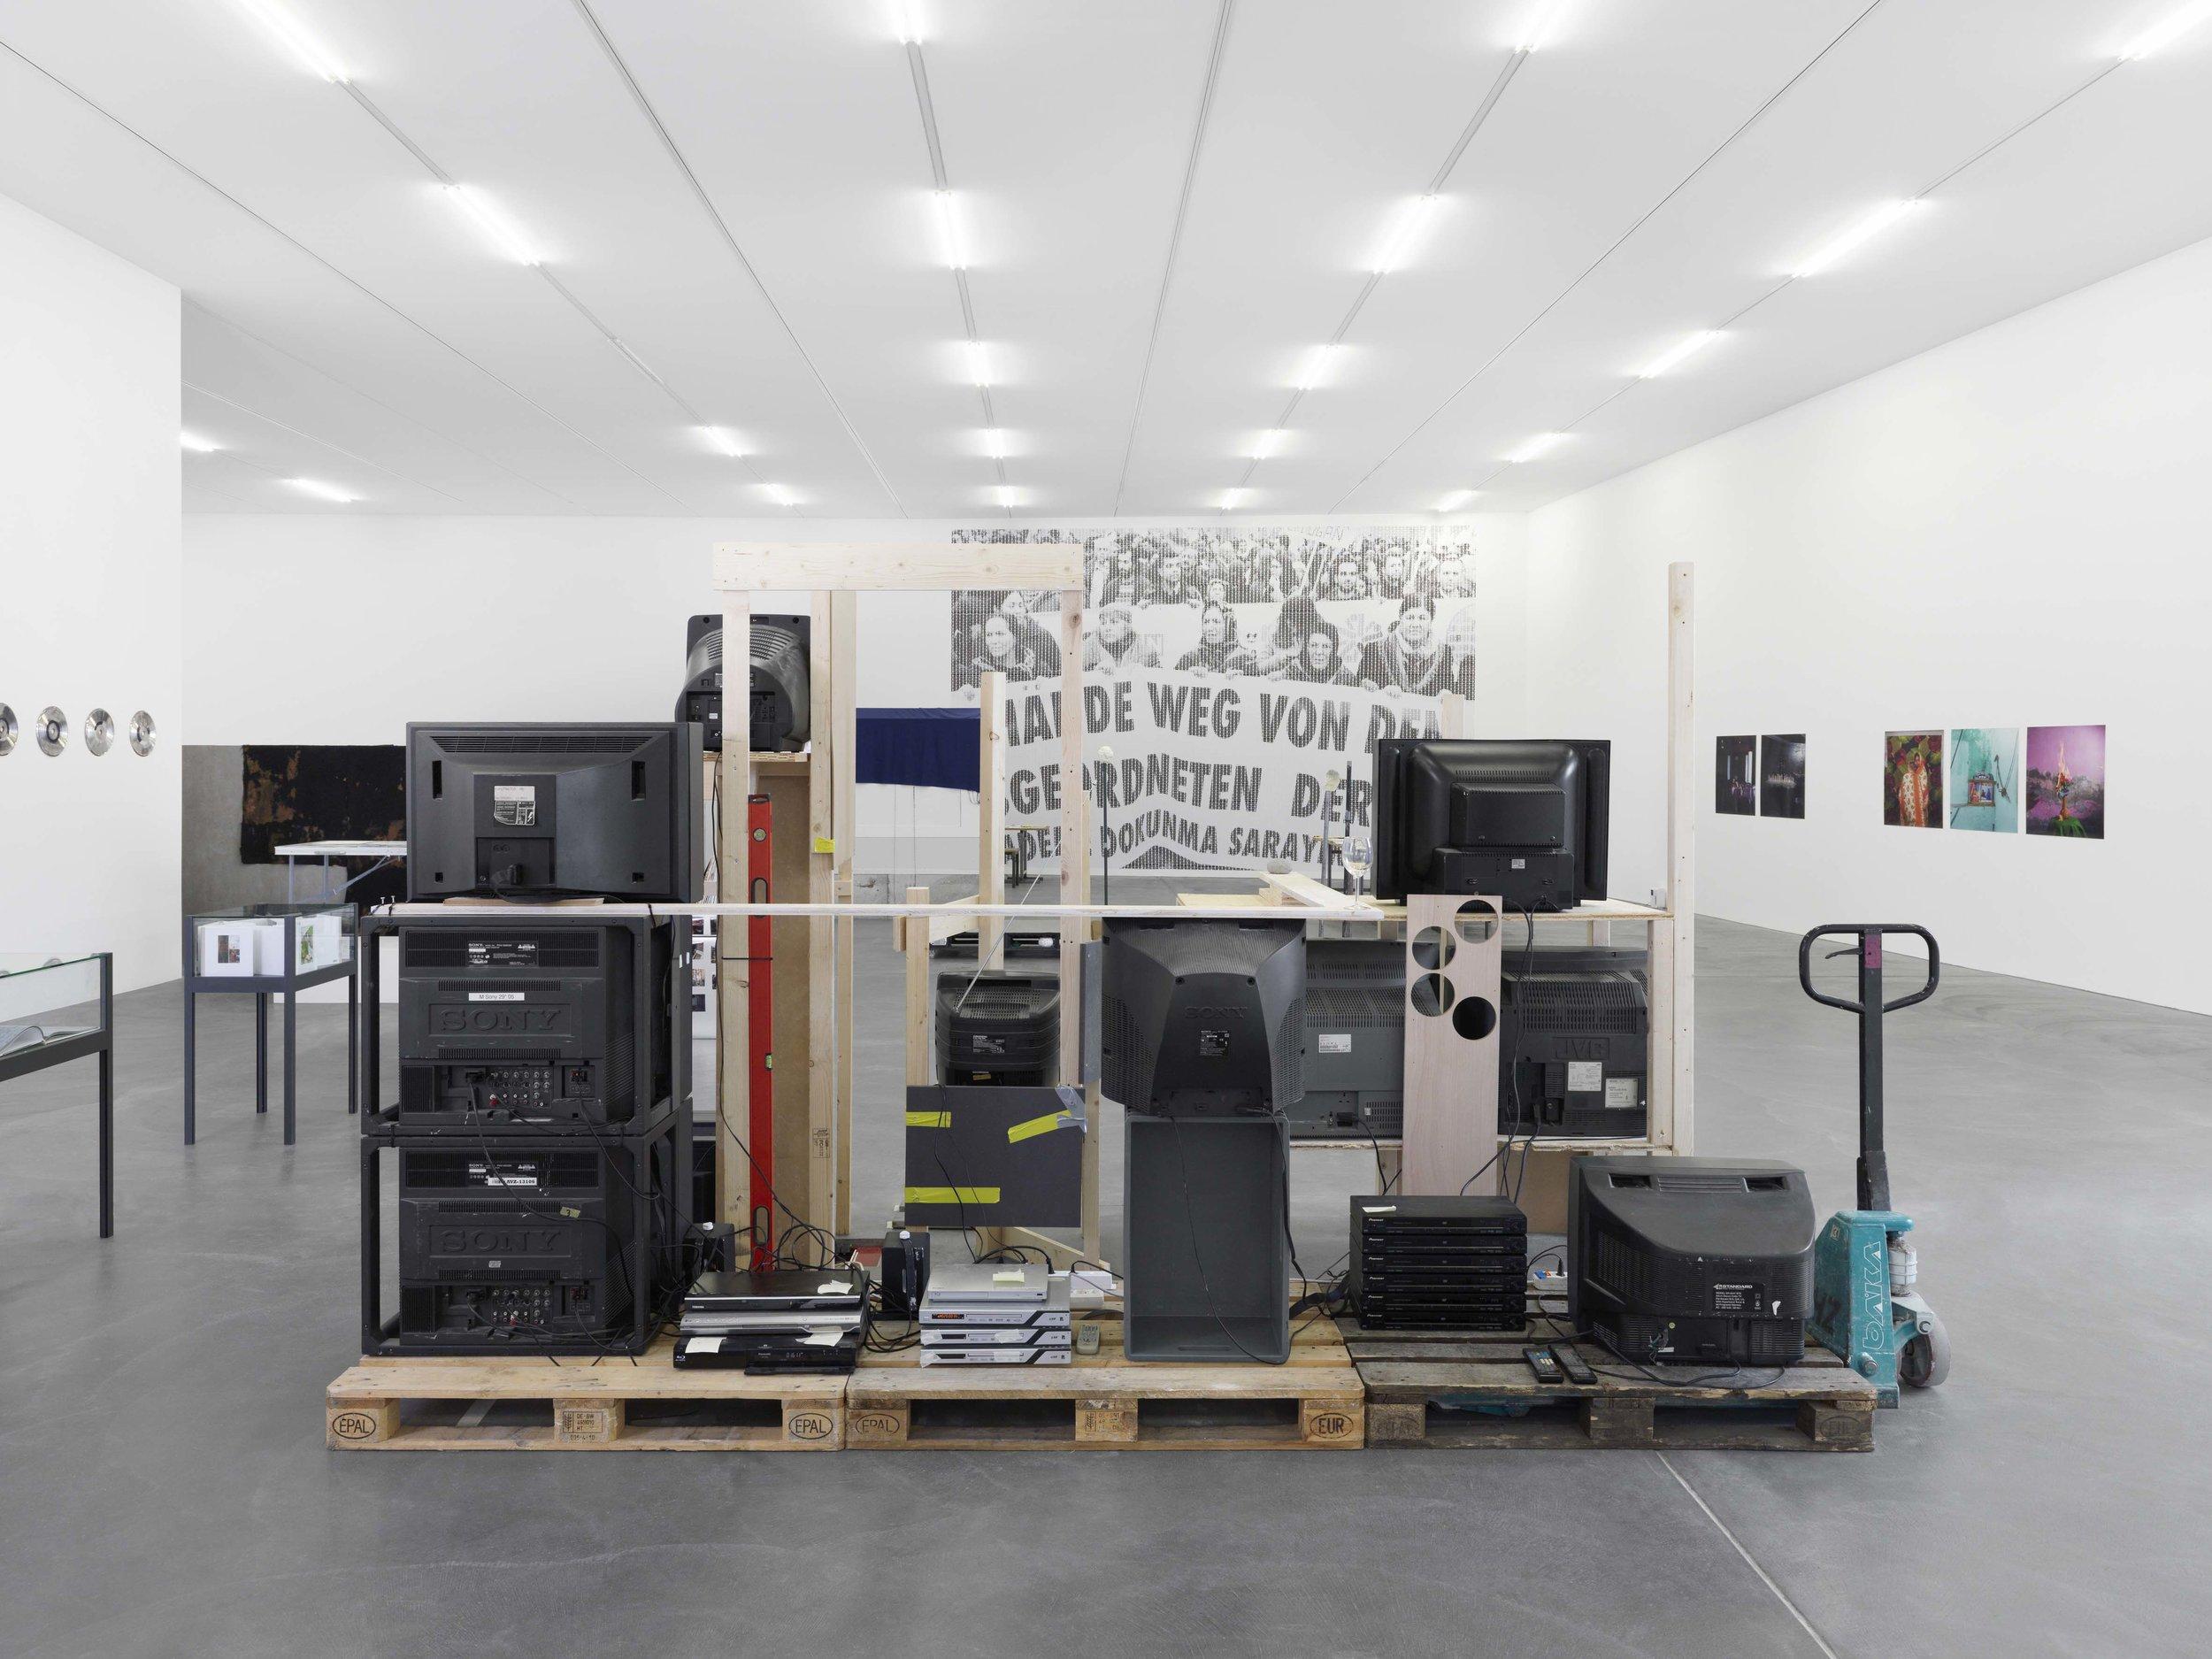 Media : sculpture, 11 films on screens, wood, pallet, roller, level, wine glass, technical instructions / 2017 / Photo credit: Annik Wetter, kunsthalle zurich